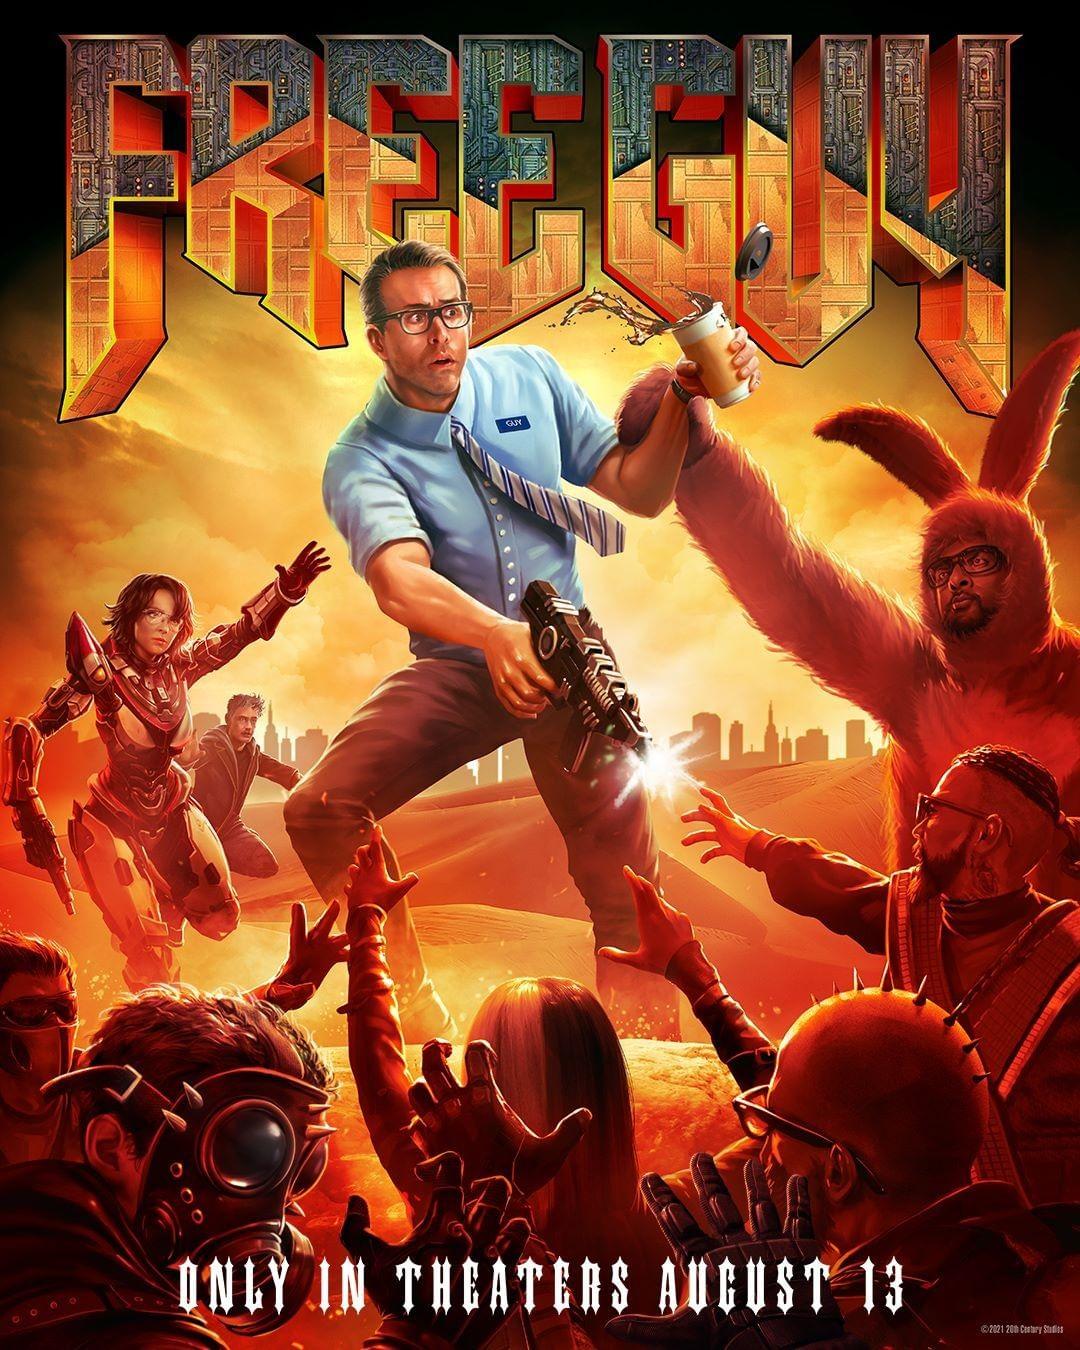 free guy posters videojuegos